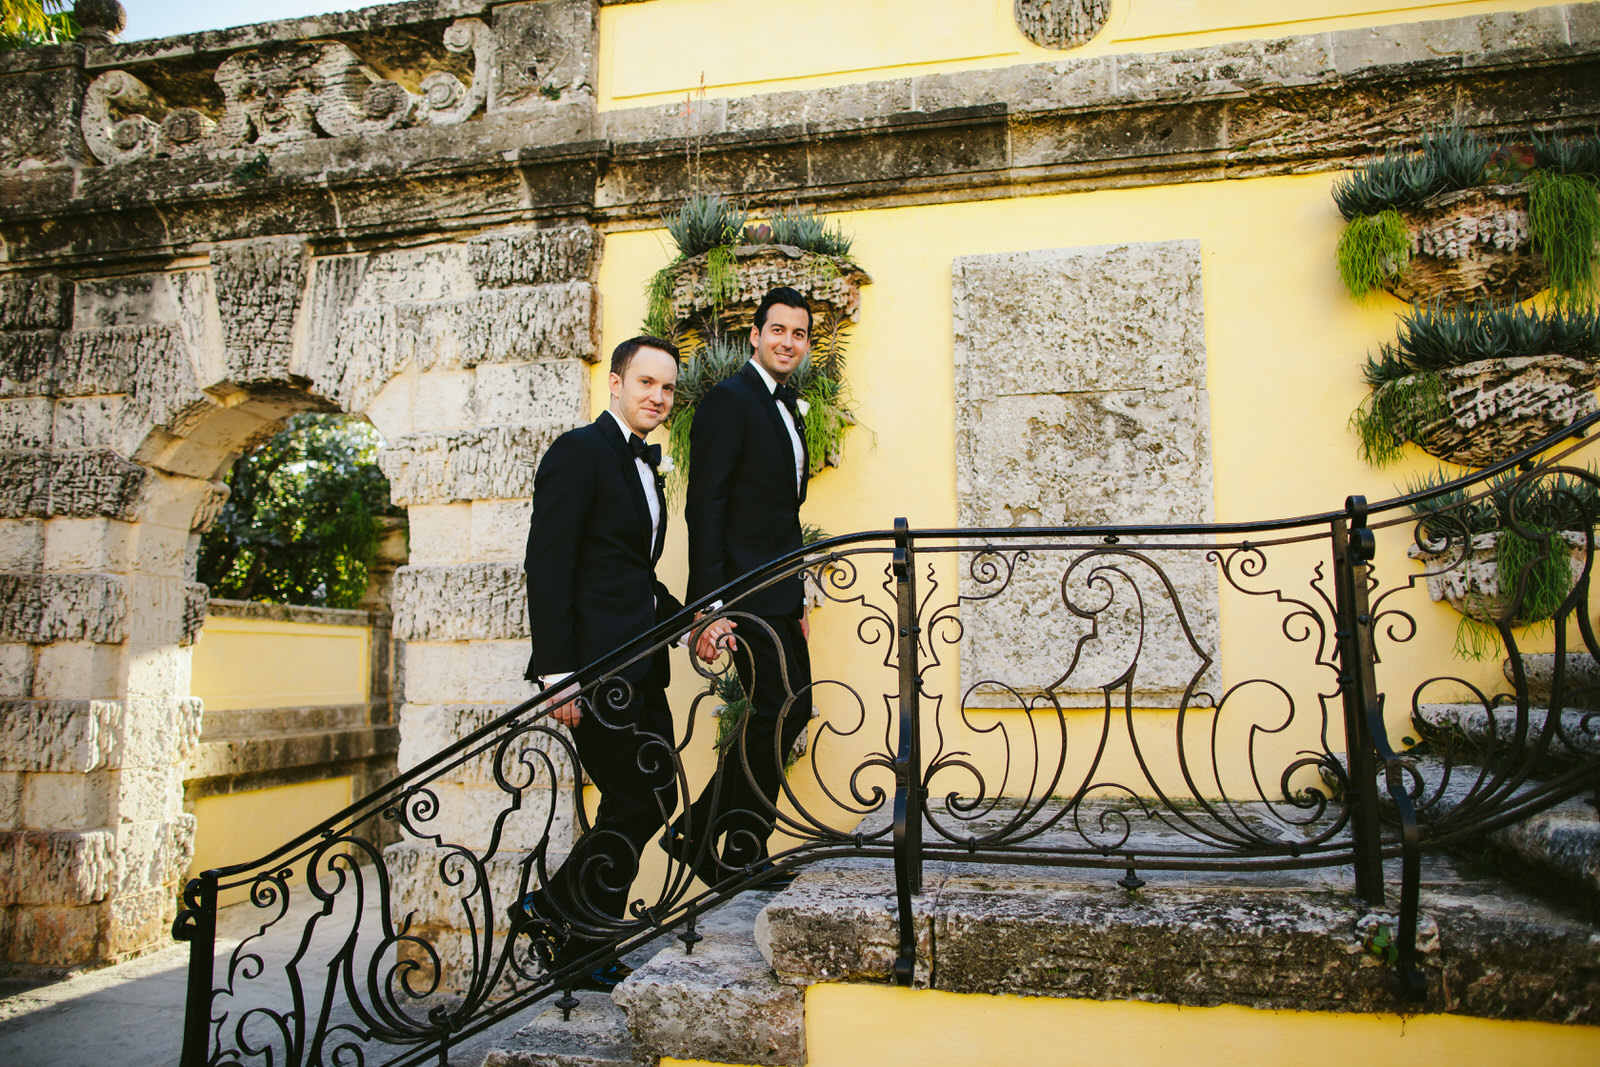 vizcaya_elopement_intimate_wedding_groom_portraits_after_ceremony-46.jpg